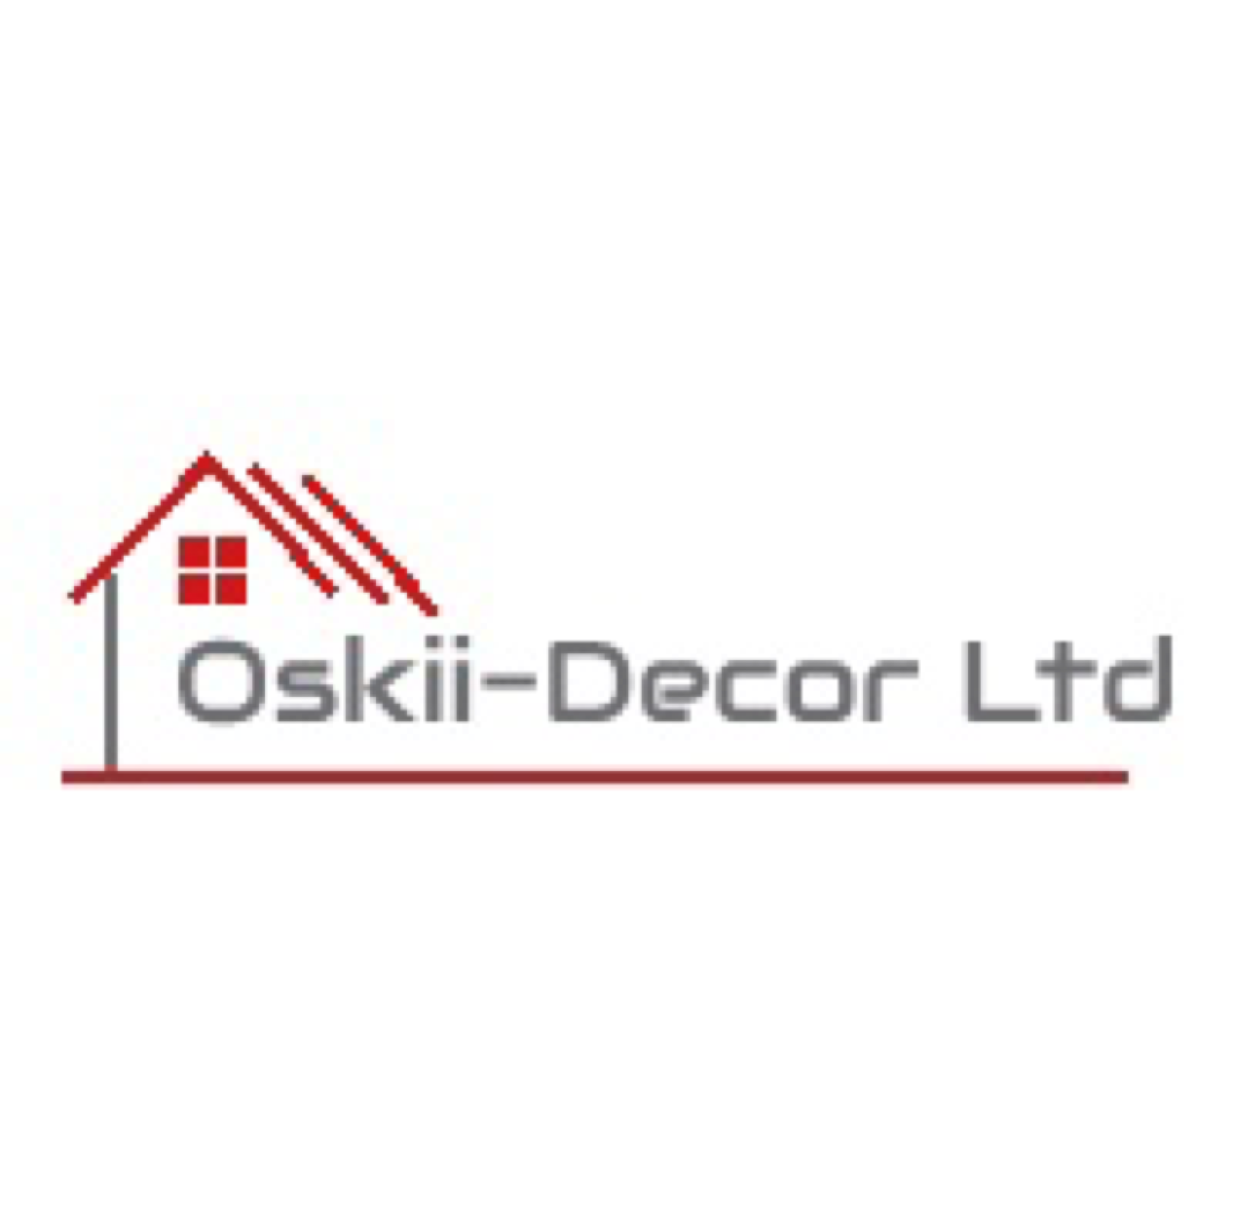 Oskii-Decor Ltd